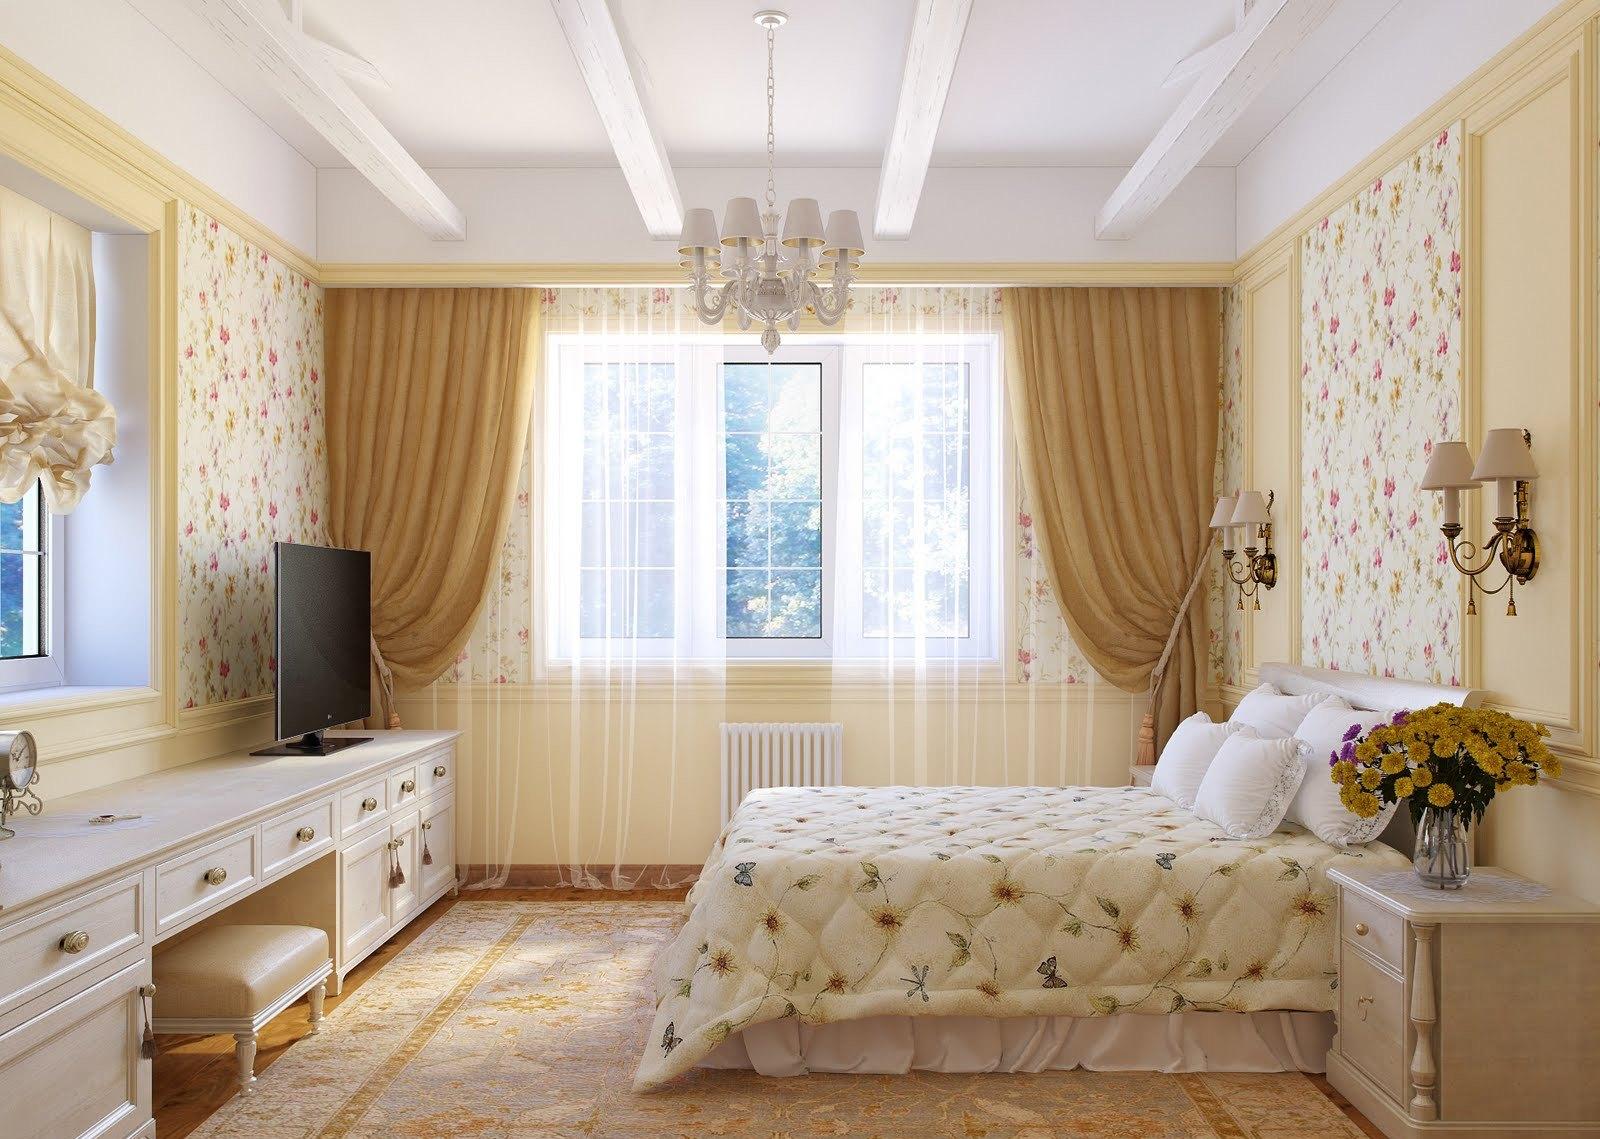 Дизайн частного дома комнат